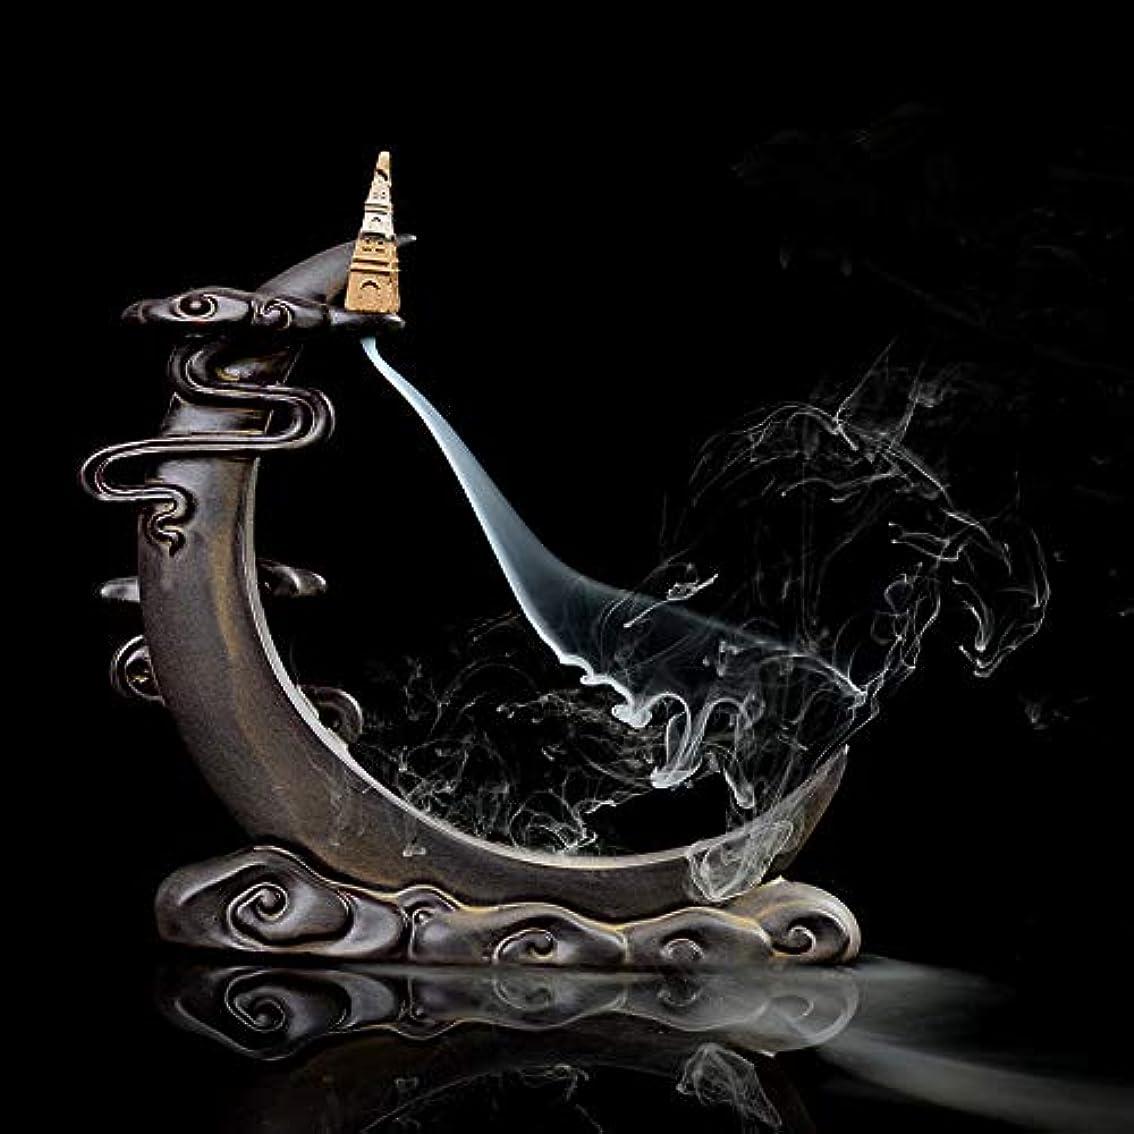 PHILOGOD Incense Holders Ceramic Moon Styling Dual Use Sticks Backflow Burner/Censer